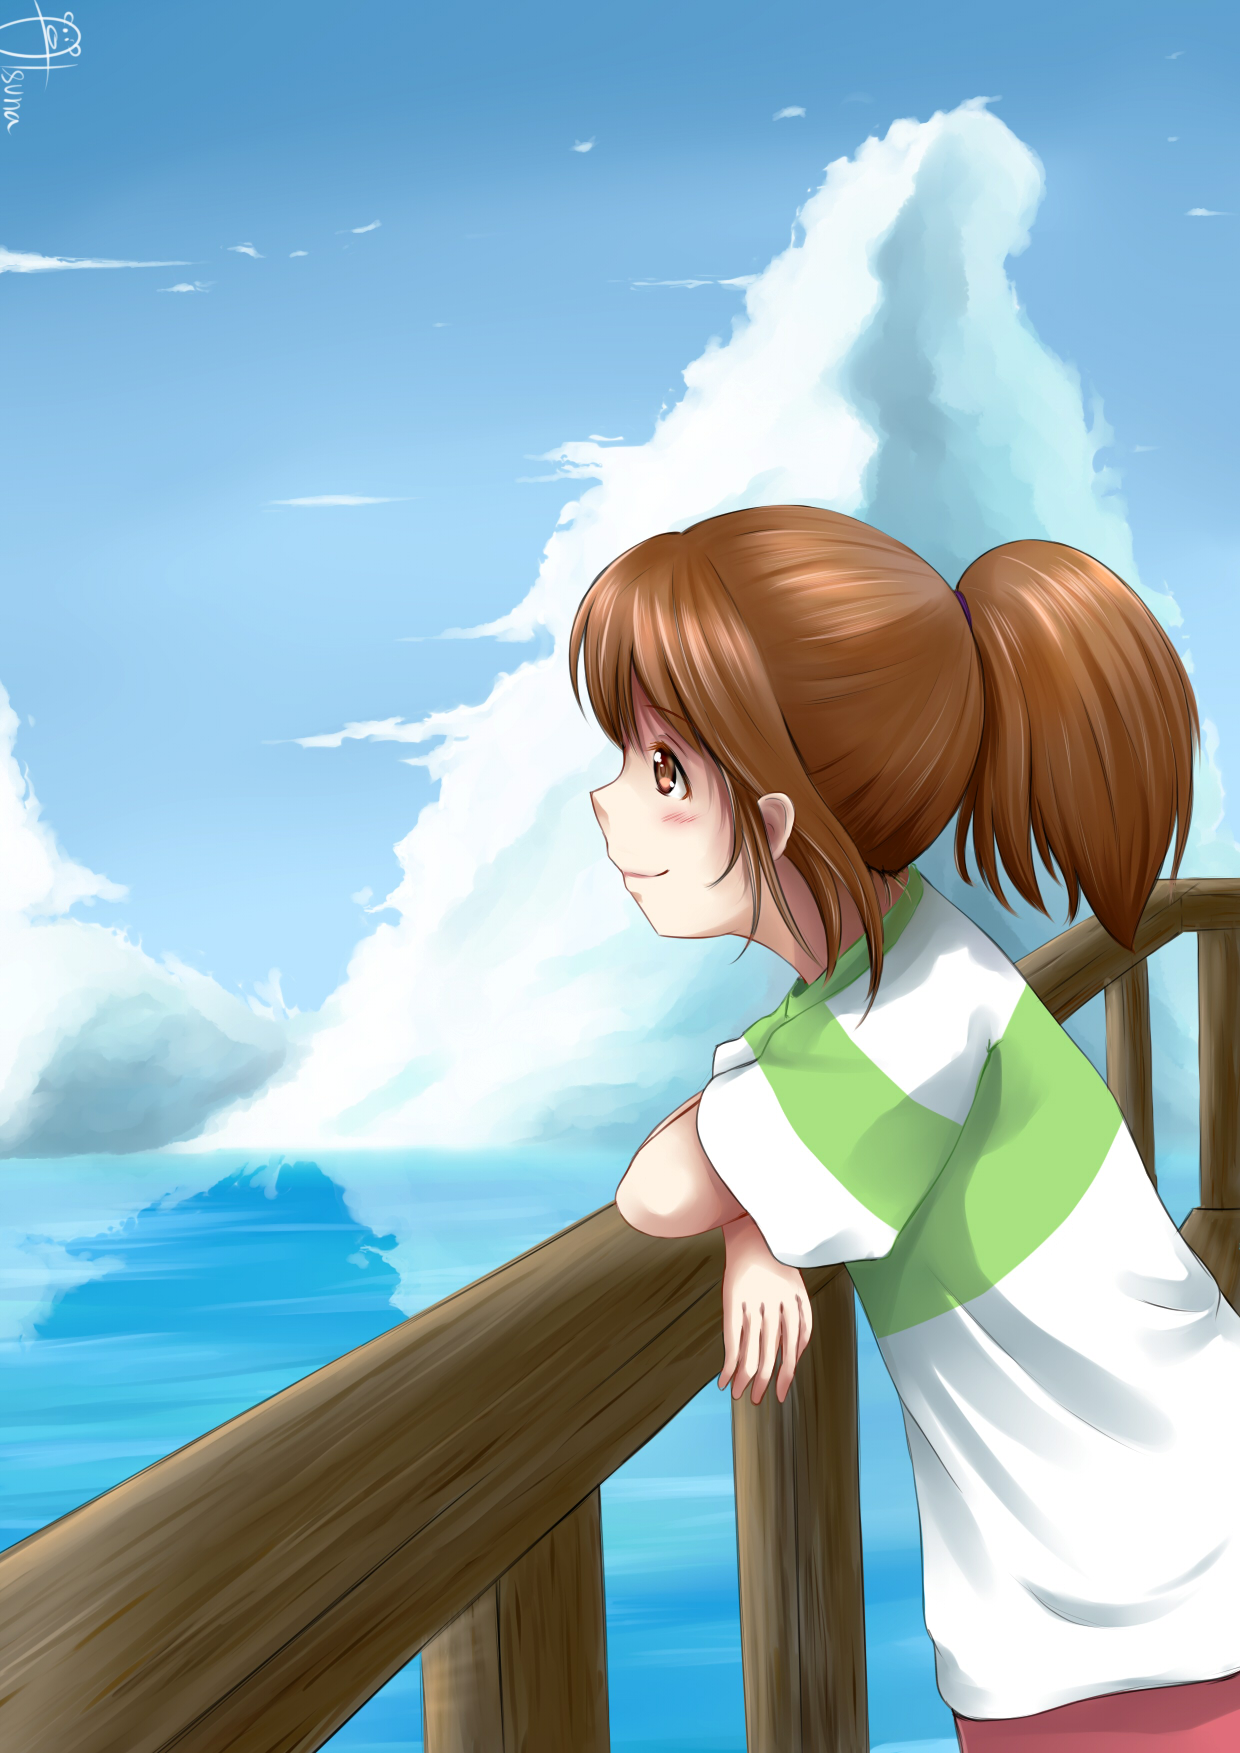 Fan Art Spirited Away Chihiro By Selvaria B On Deviantart